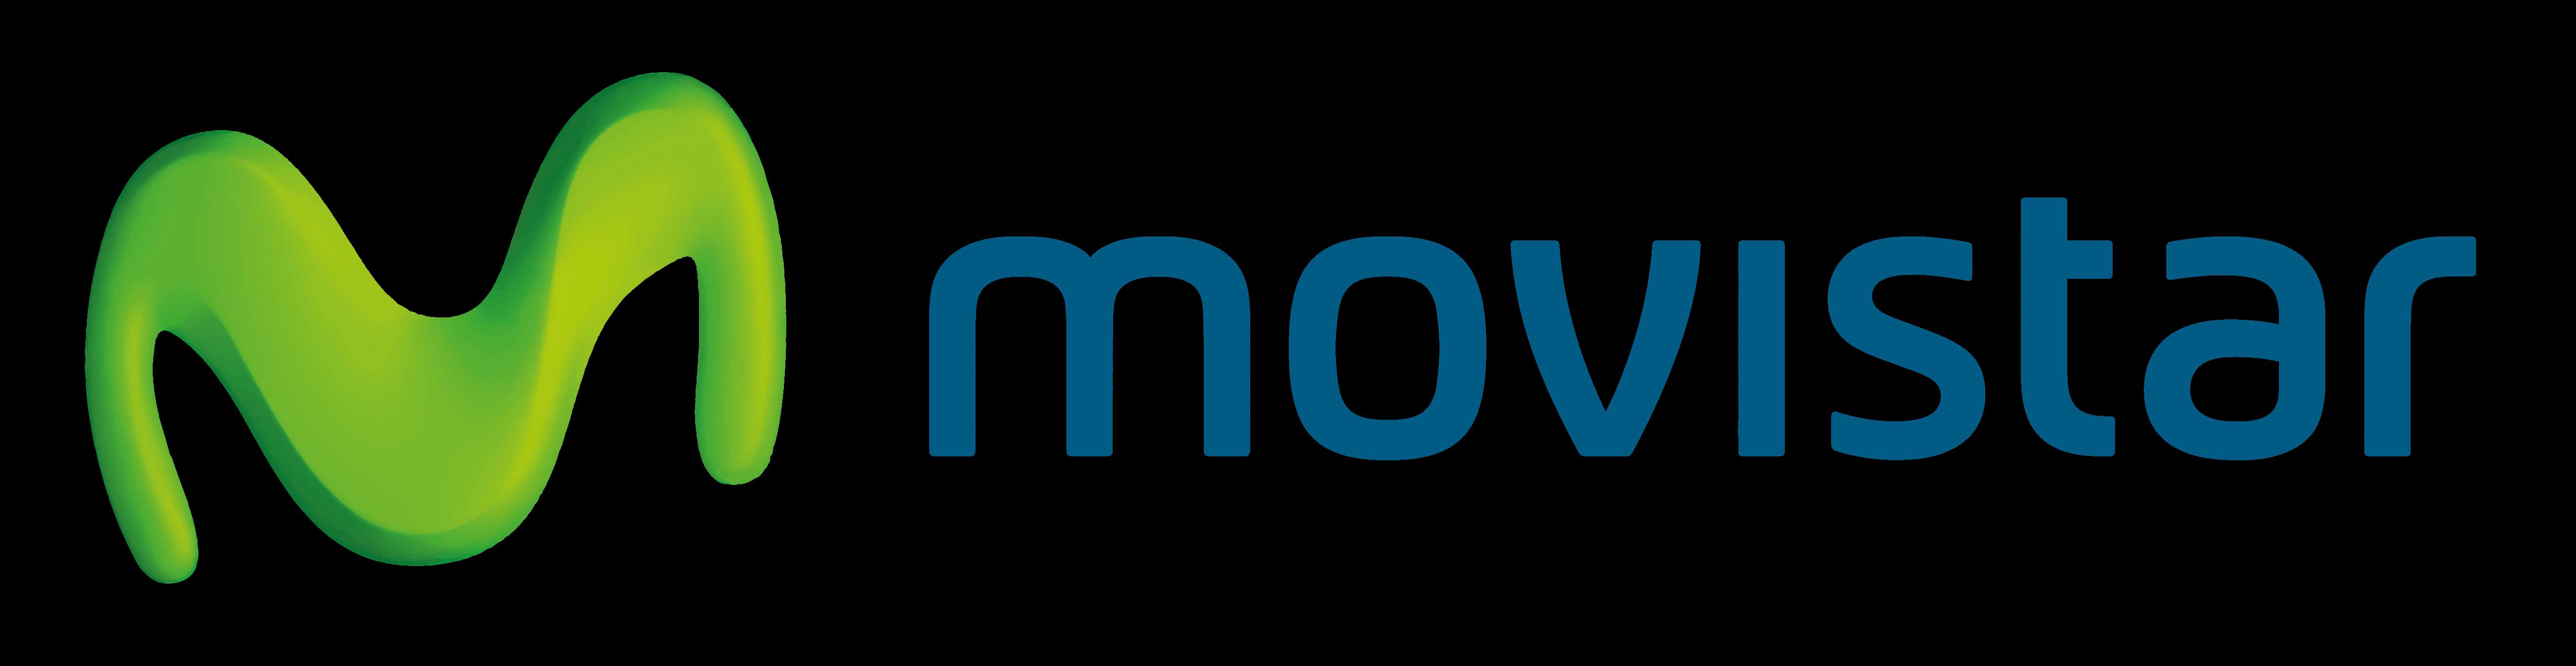 Image Result For Movistar